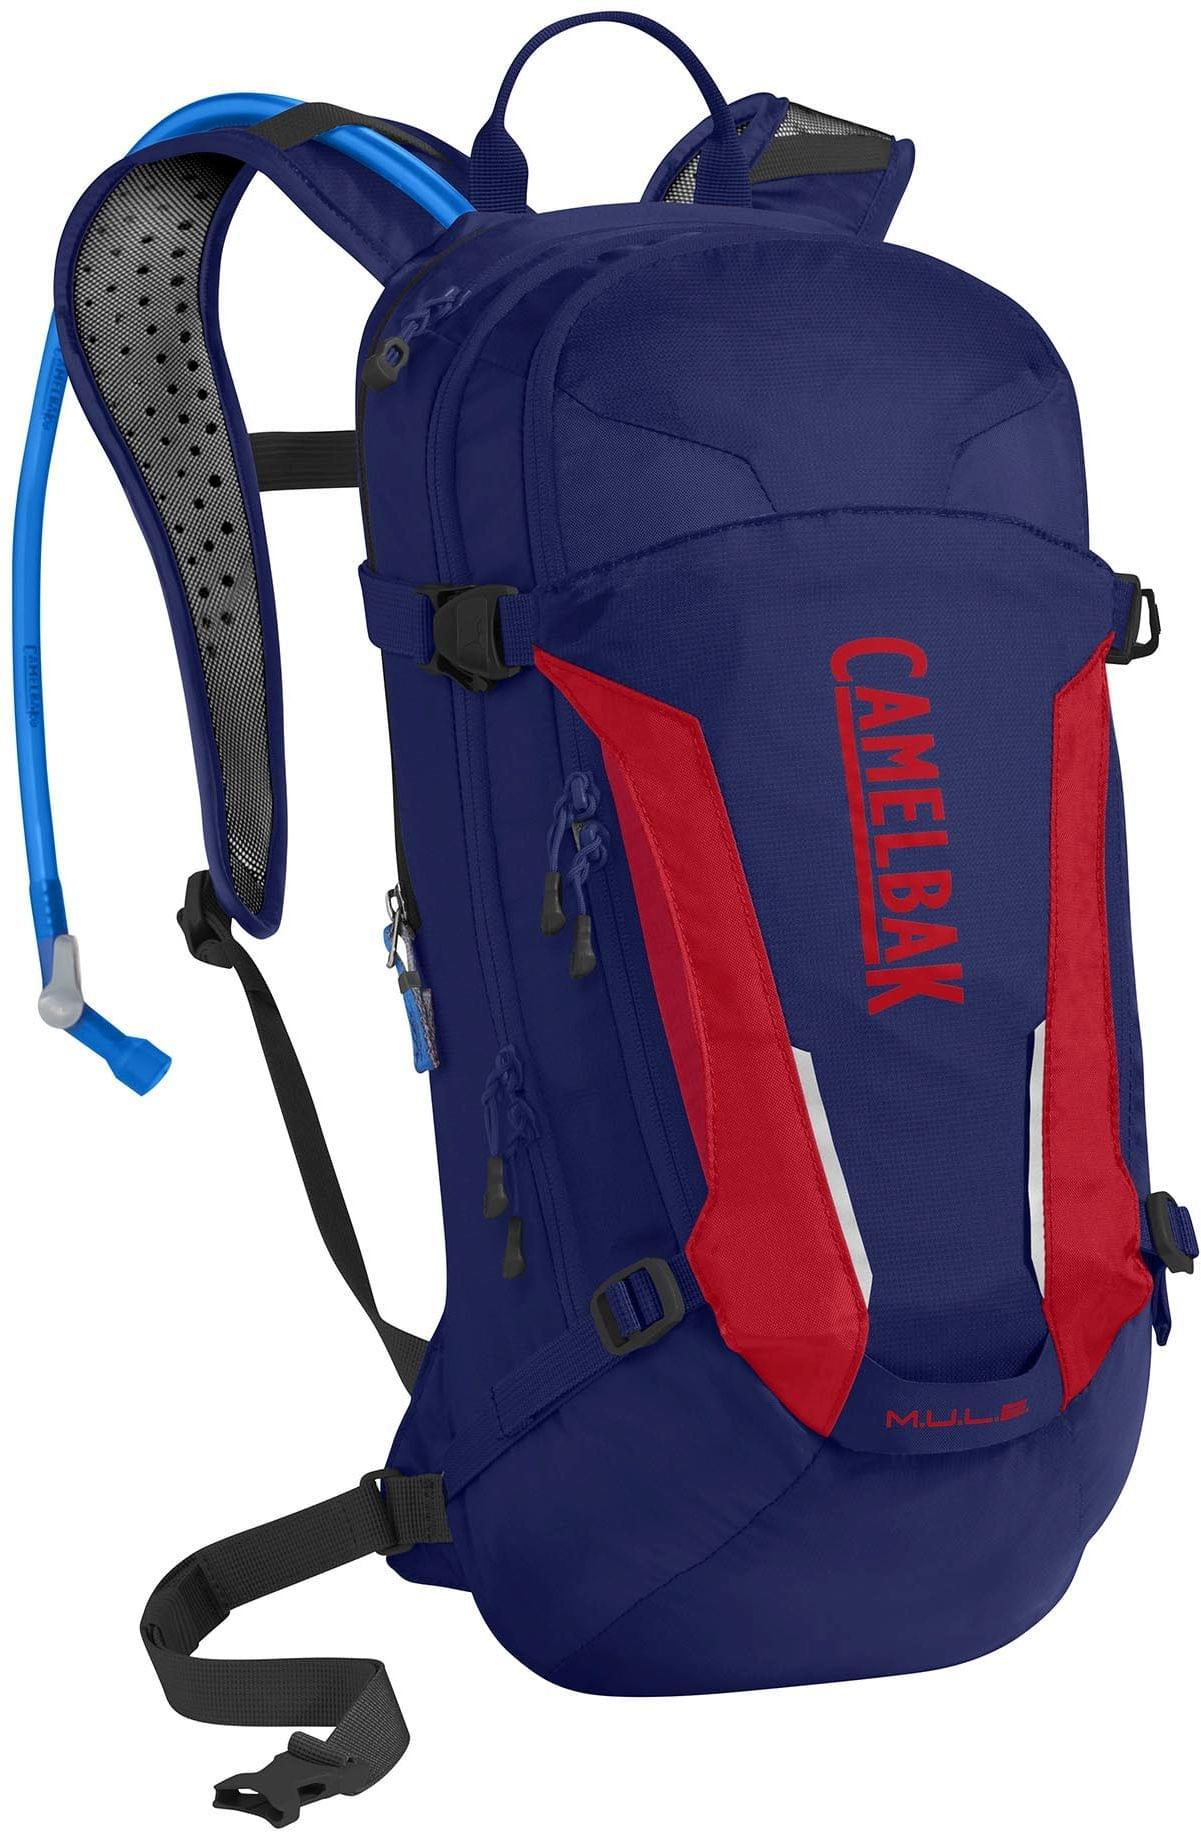 083b1f623a Cyklistický batoh Camelbak Mule - Pitch Blue Racing Red - Spot Shop